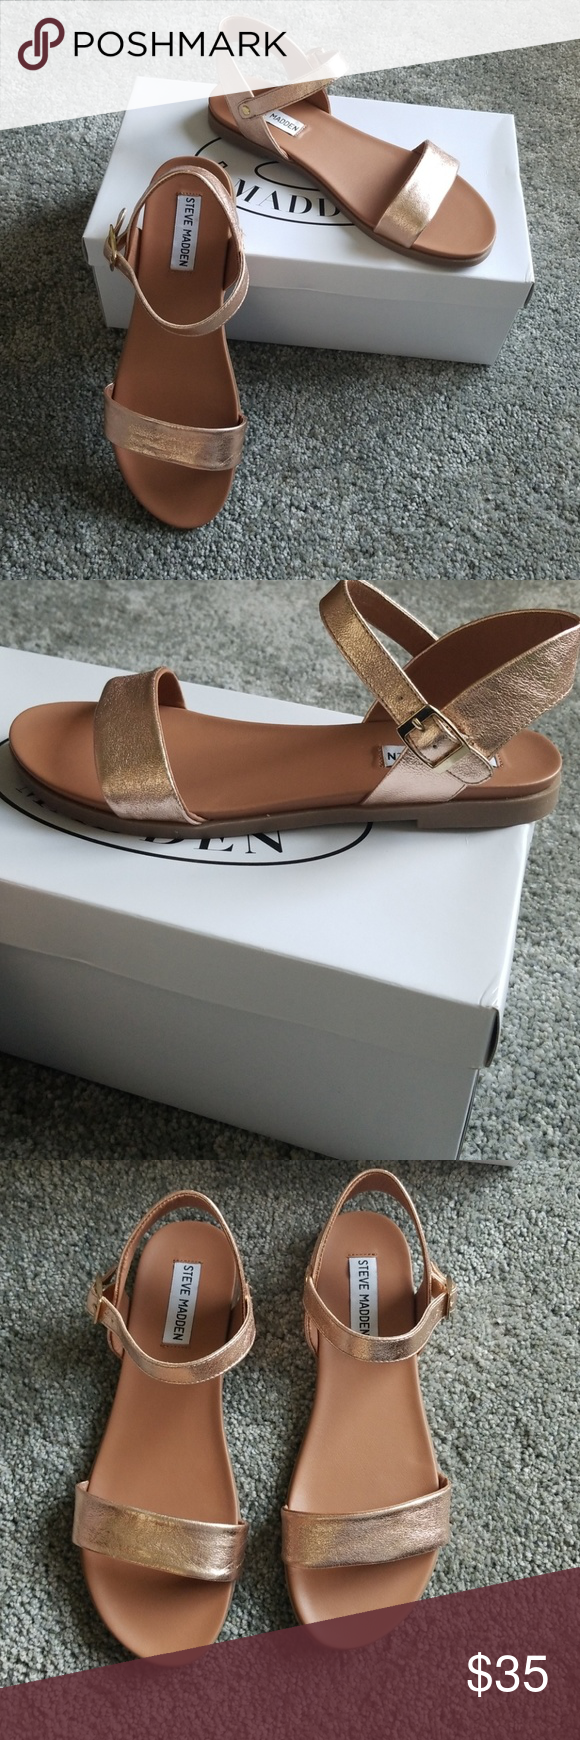 58c5b8ec52b0 Womens Steve Madden Rose Gold Dina sandals 7.5 New in box! Steve Madden  Shoes Sandals